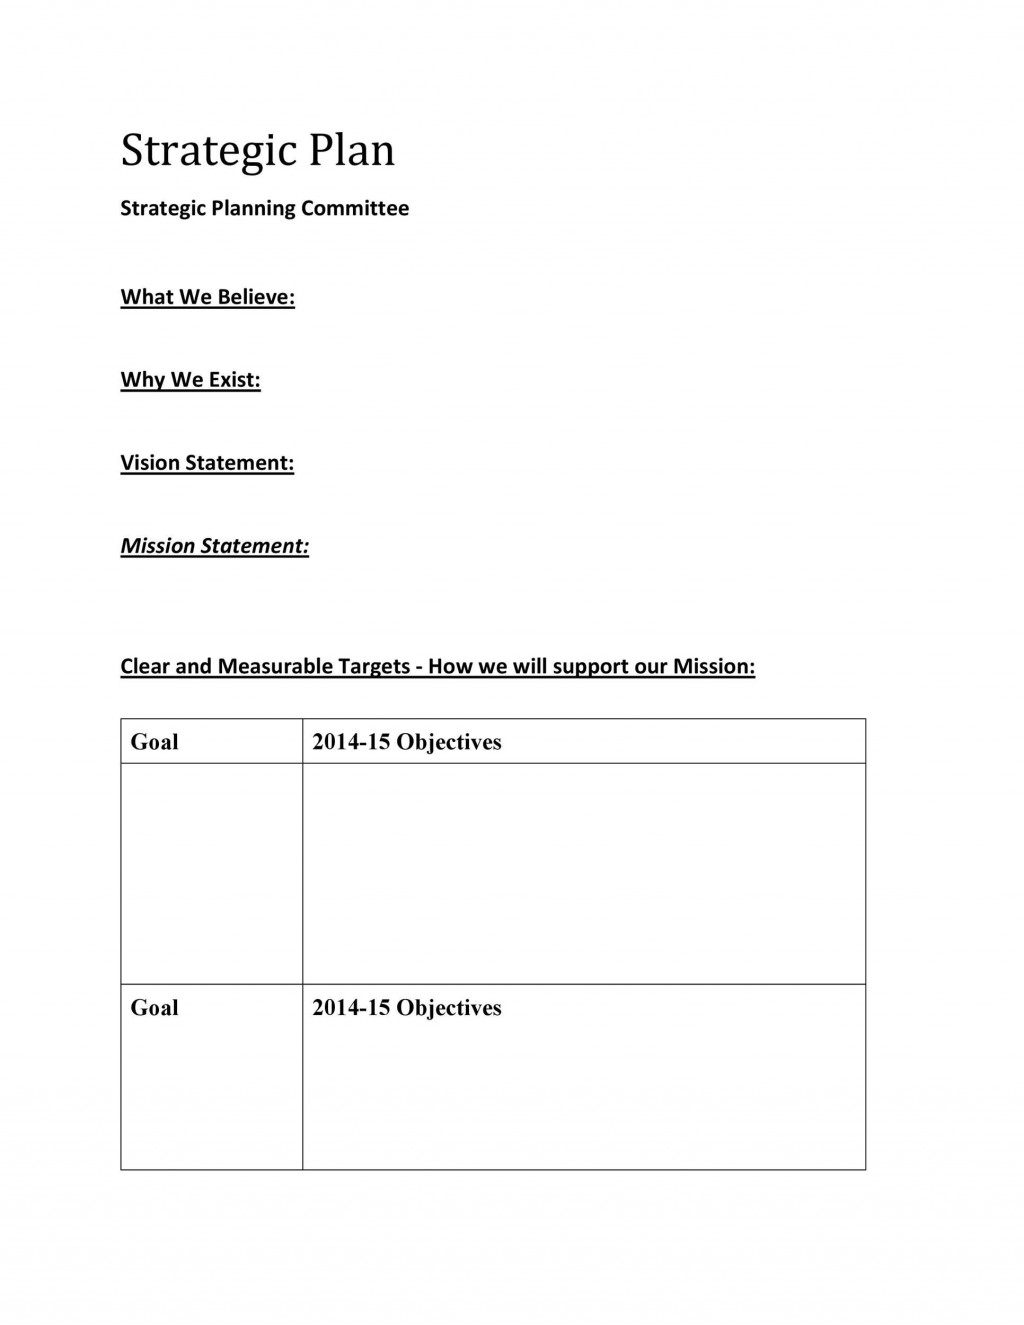 009 Shocking Strategic Plan Outline Template Photo  MarketingLarge